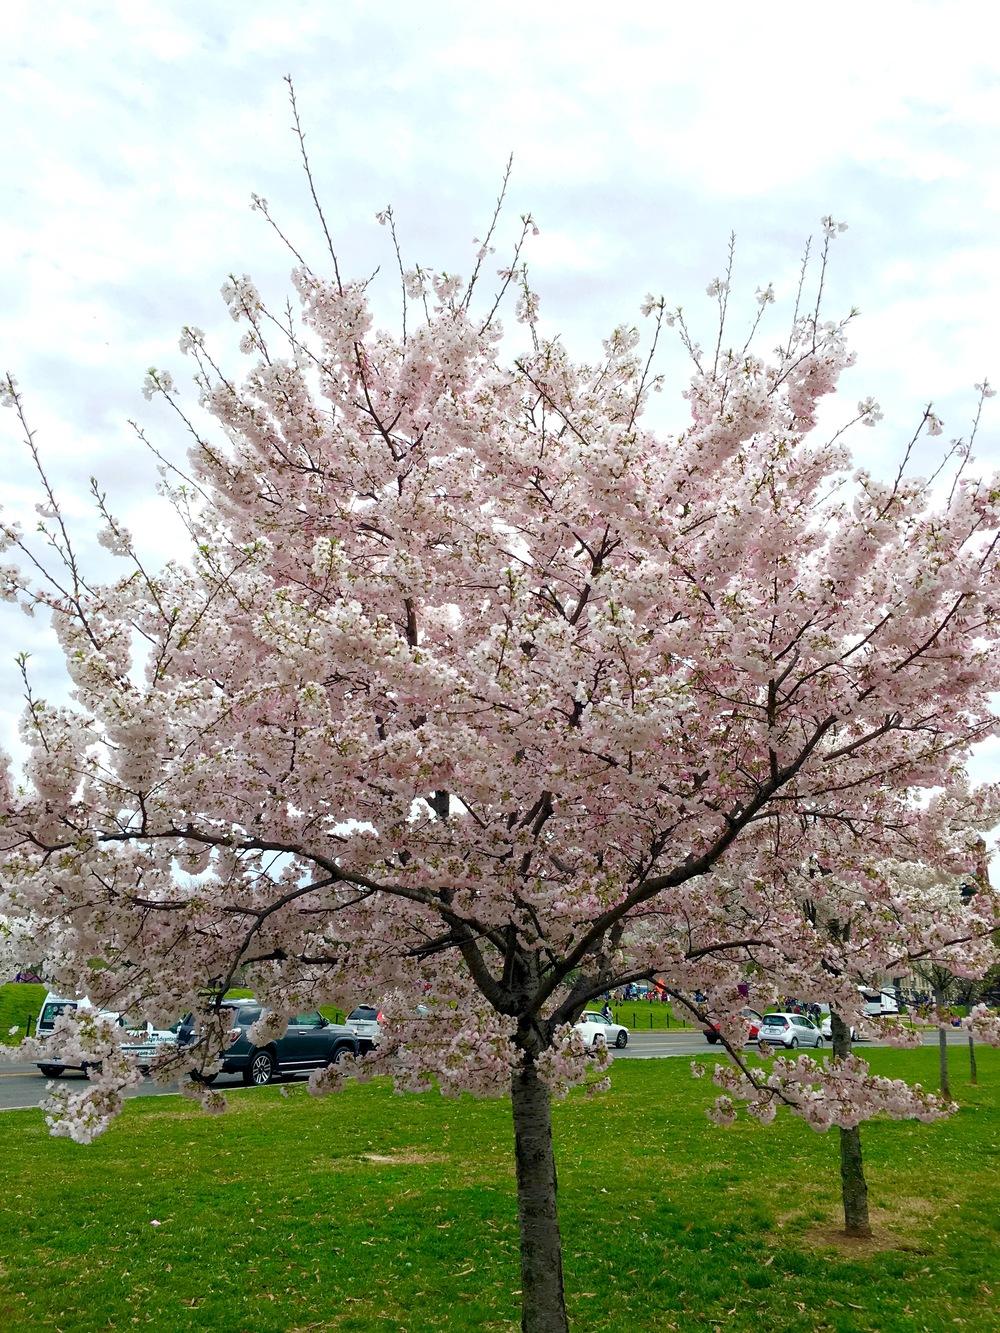 cherry-blossom-festival-washington-dc-apeachlife.jpg